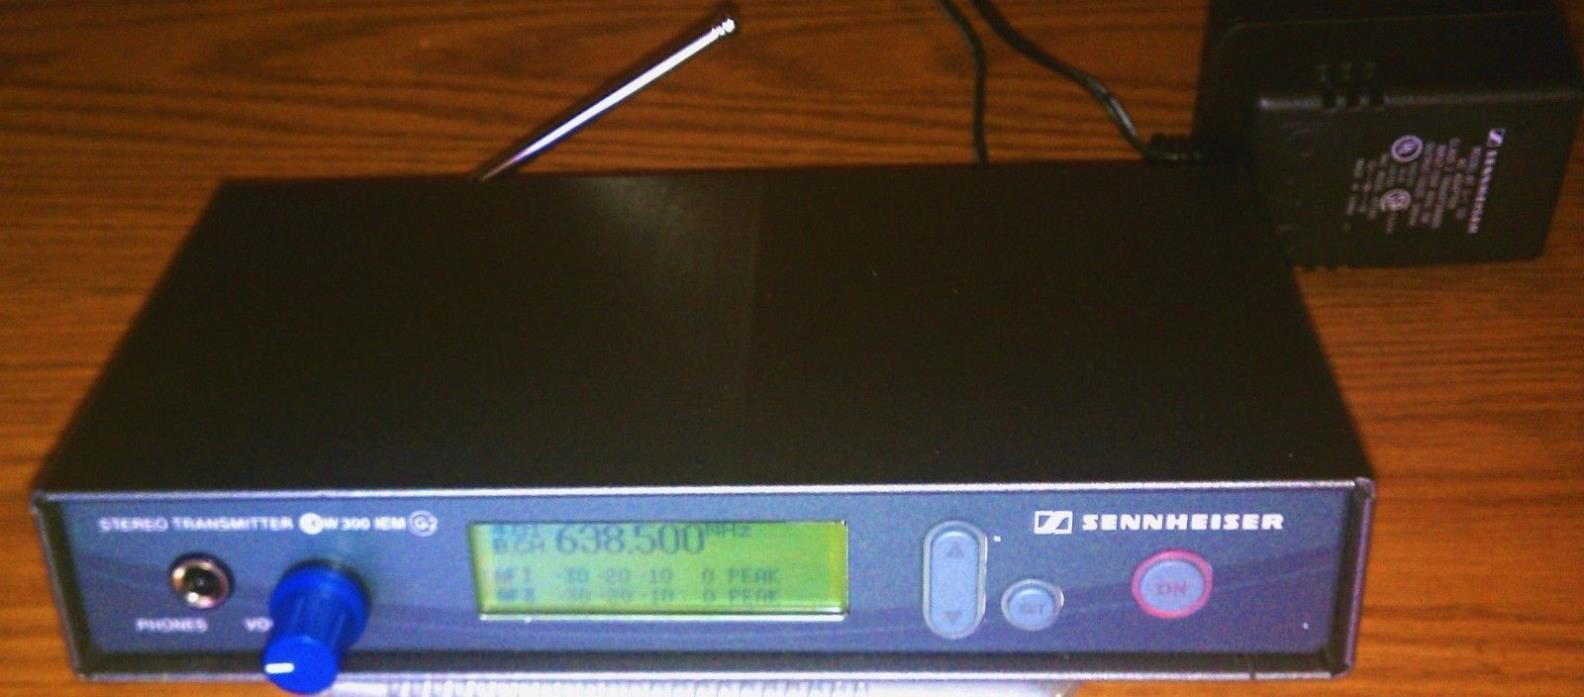 Sennheiser EW300 IEM G2 Wireless In-Ear Monitor Transmitter B 626-662 SR300IEM